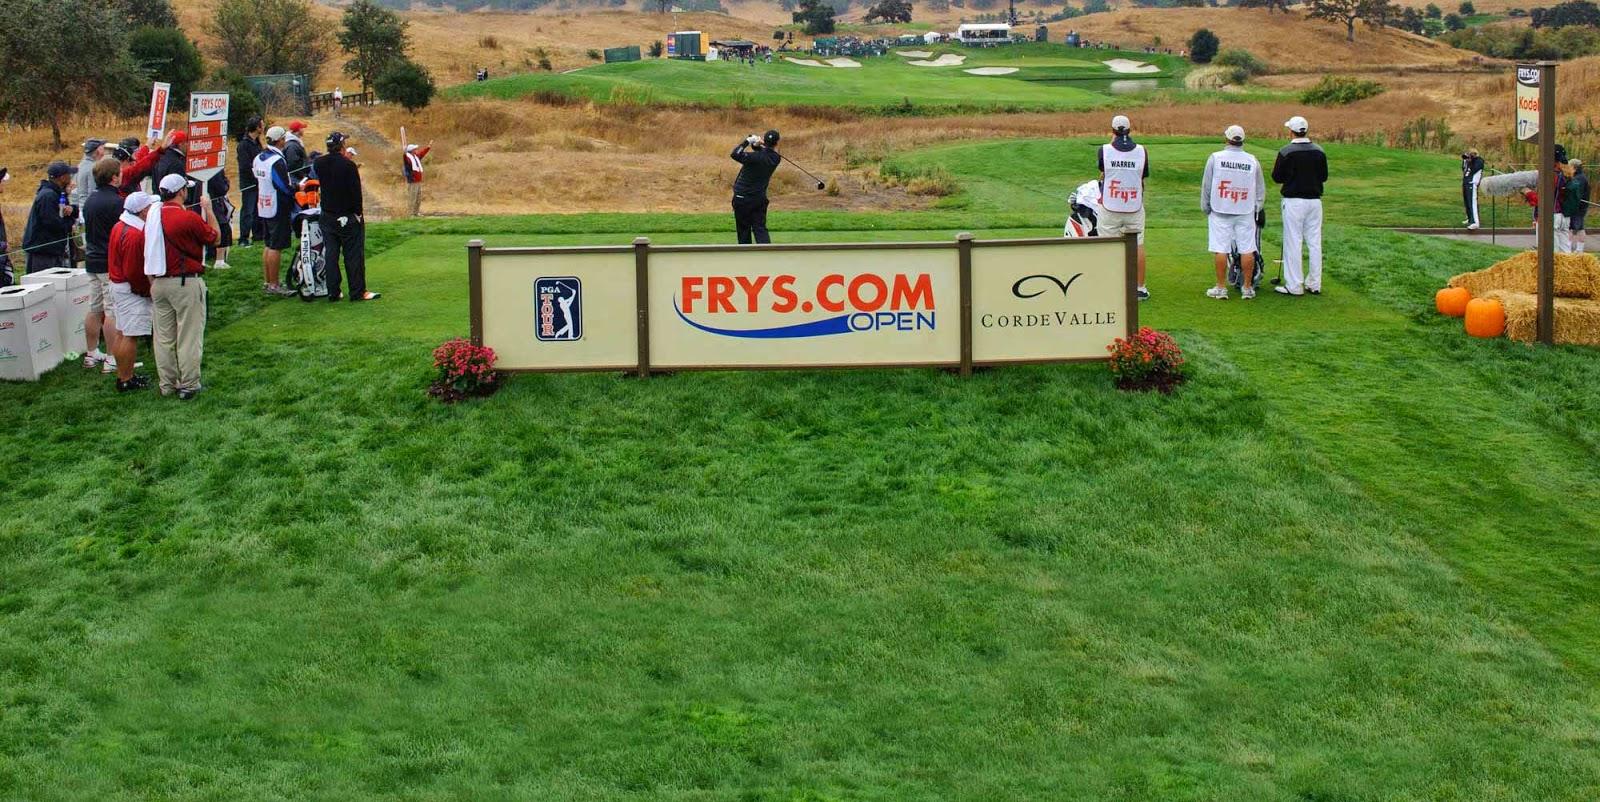 frys.com 2014